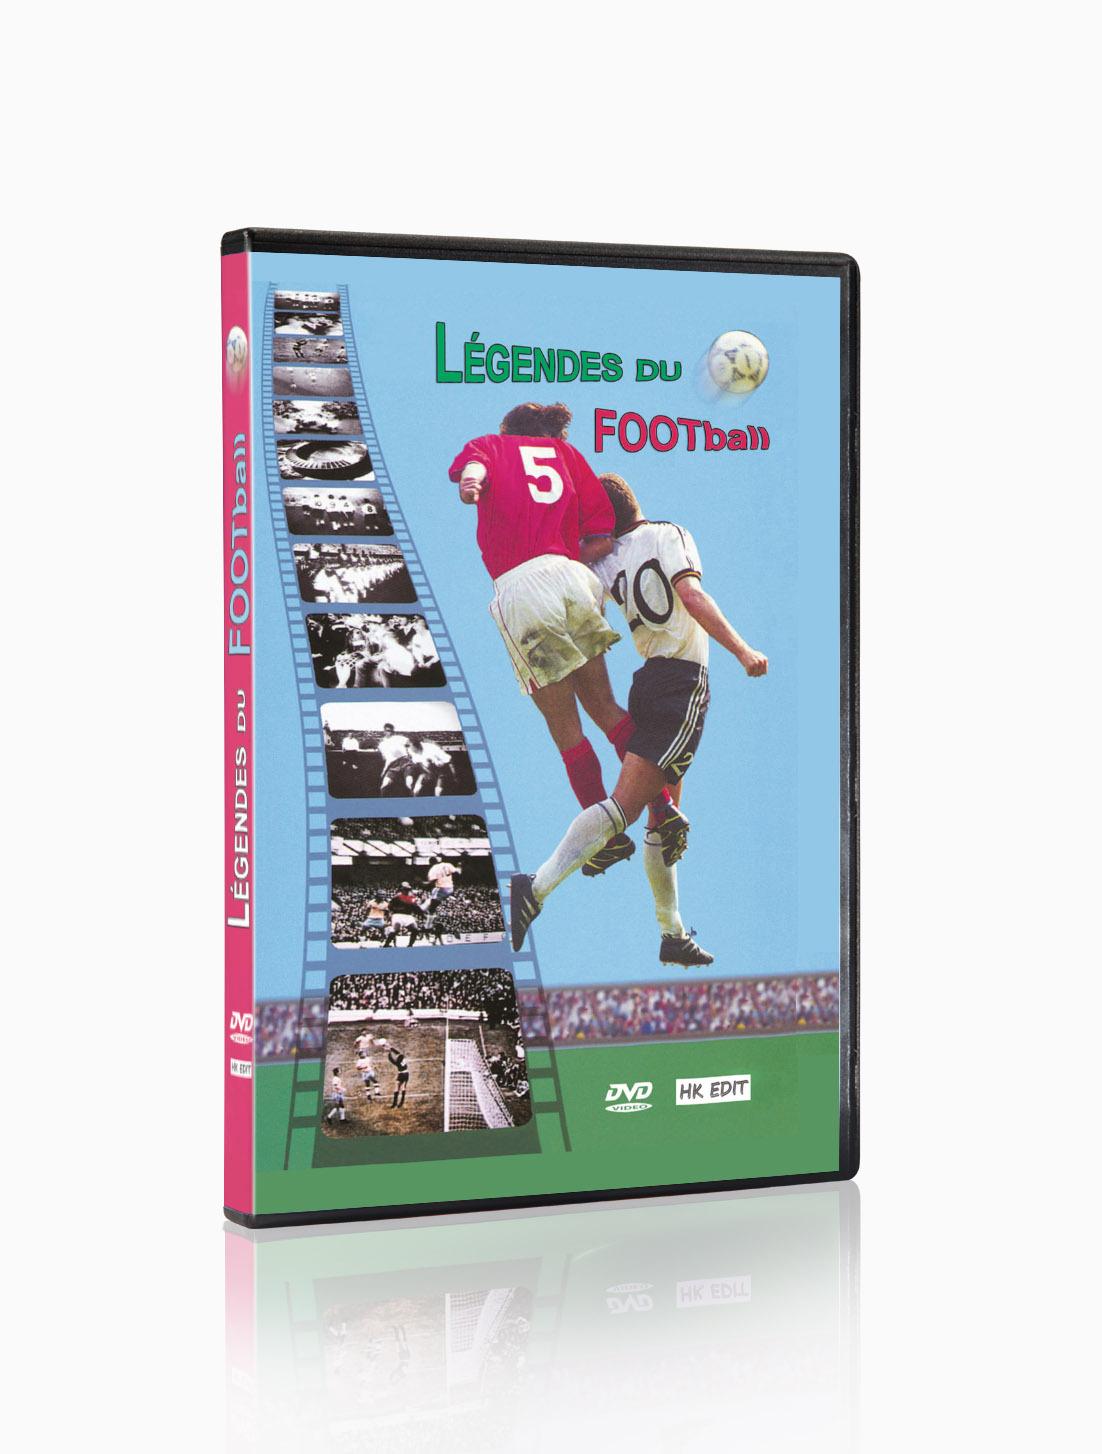 LEGENDES DU FOOTBALL - DVD